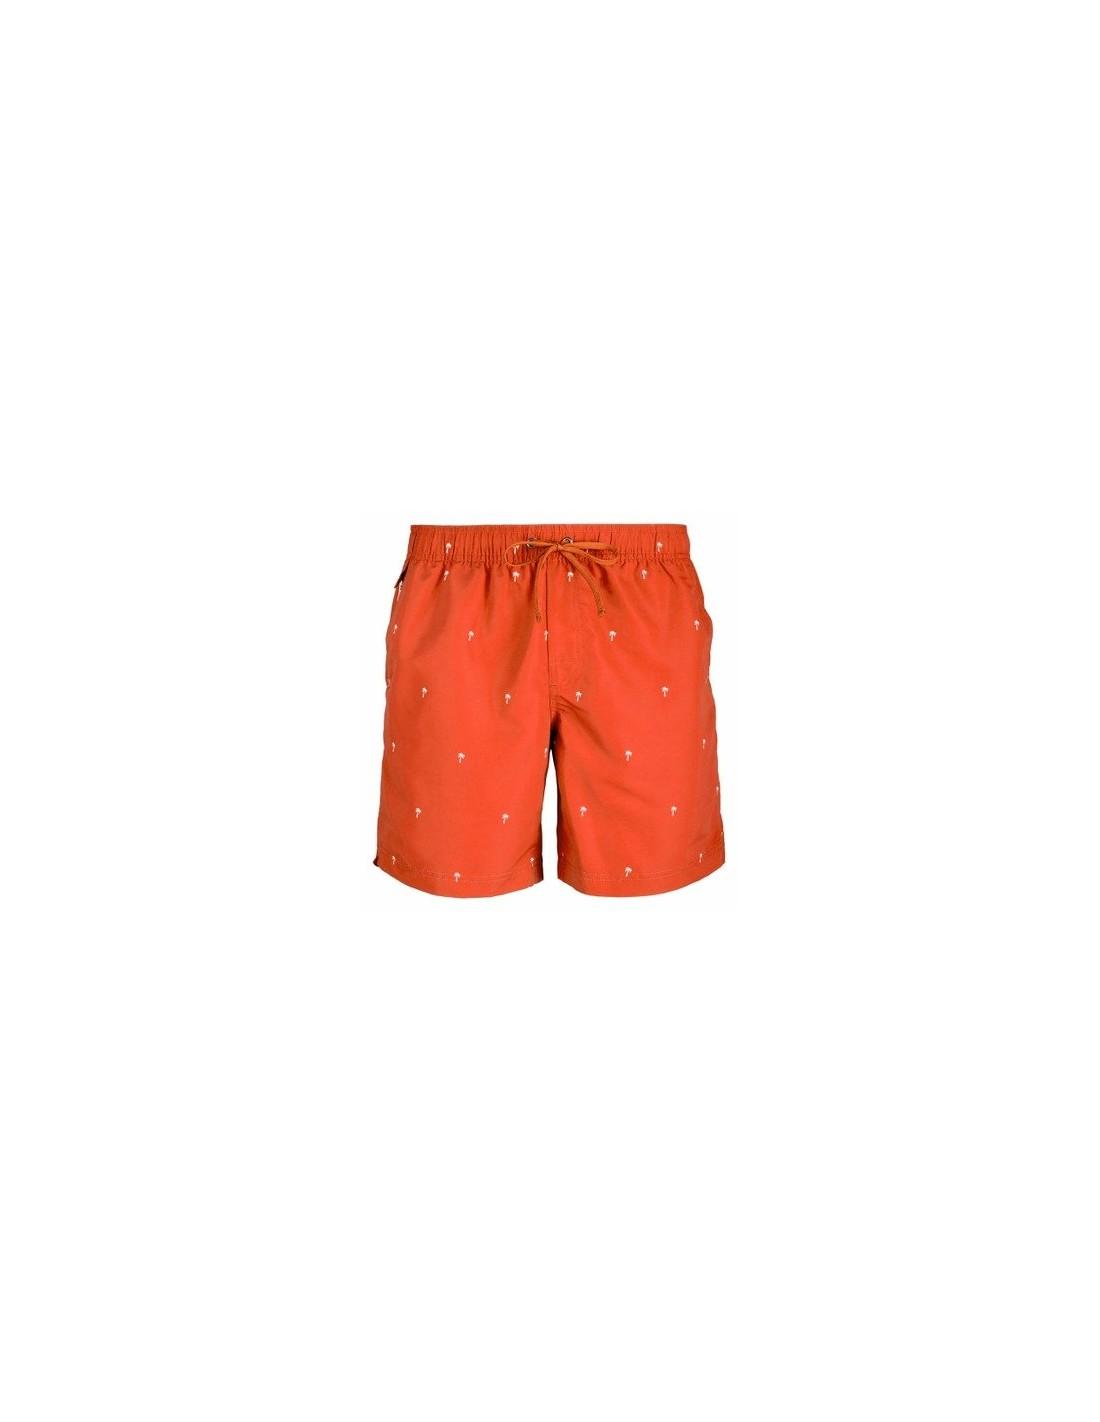 b4cc1611 Piratbukser & Shorts Herrer Bula Scale Shorts Herre 712117 ...